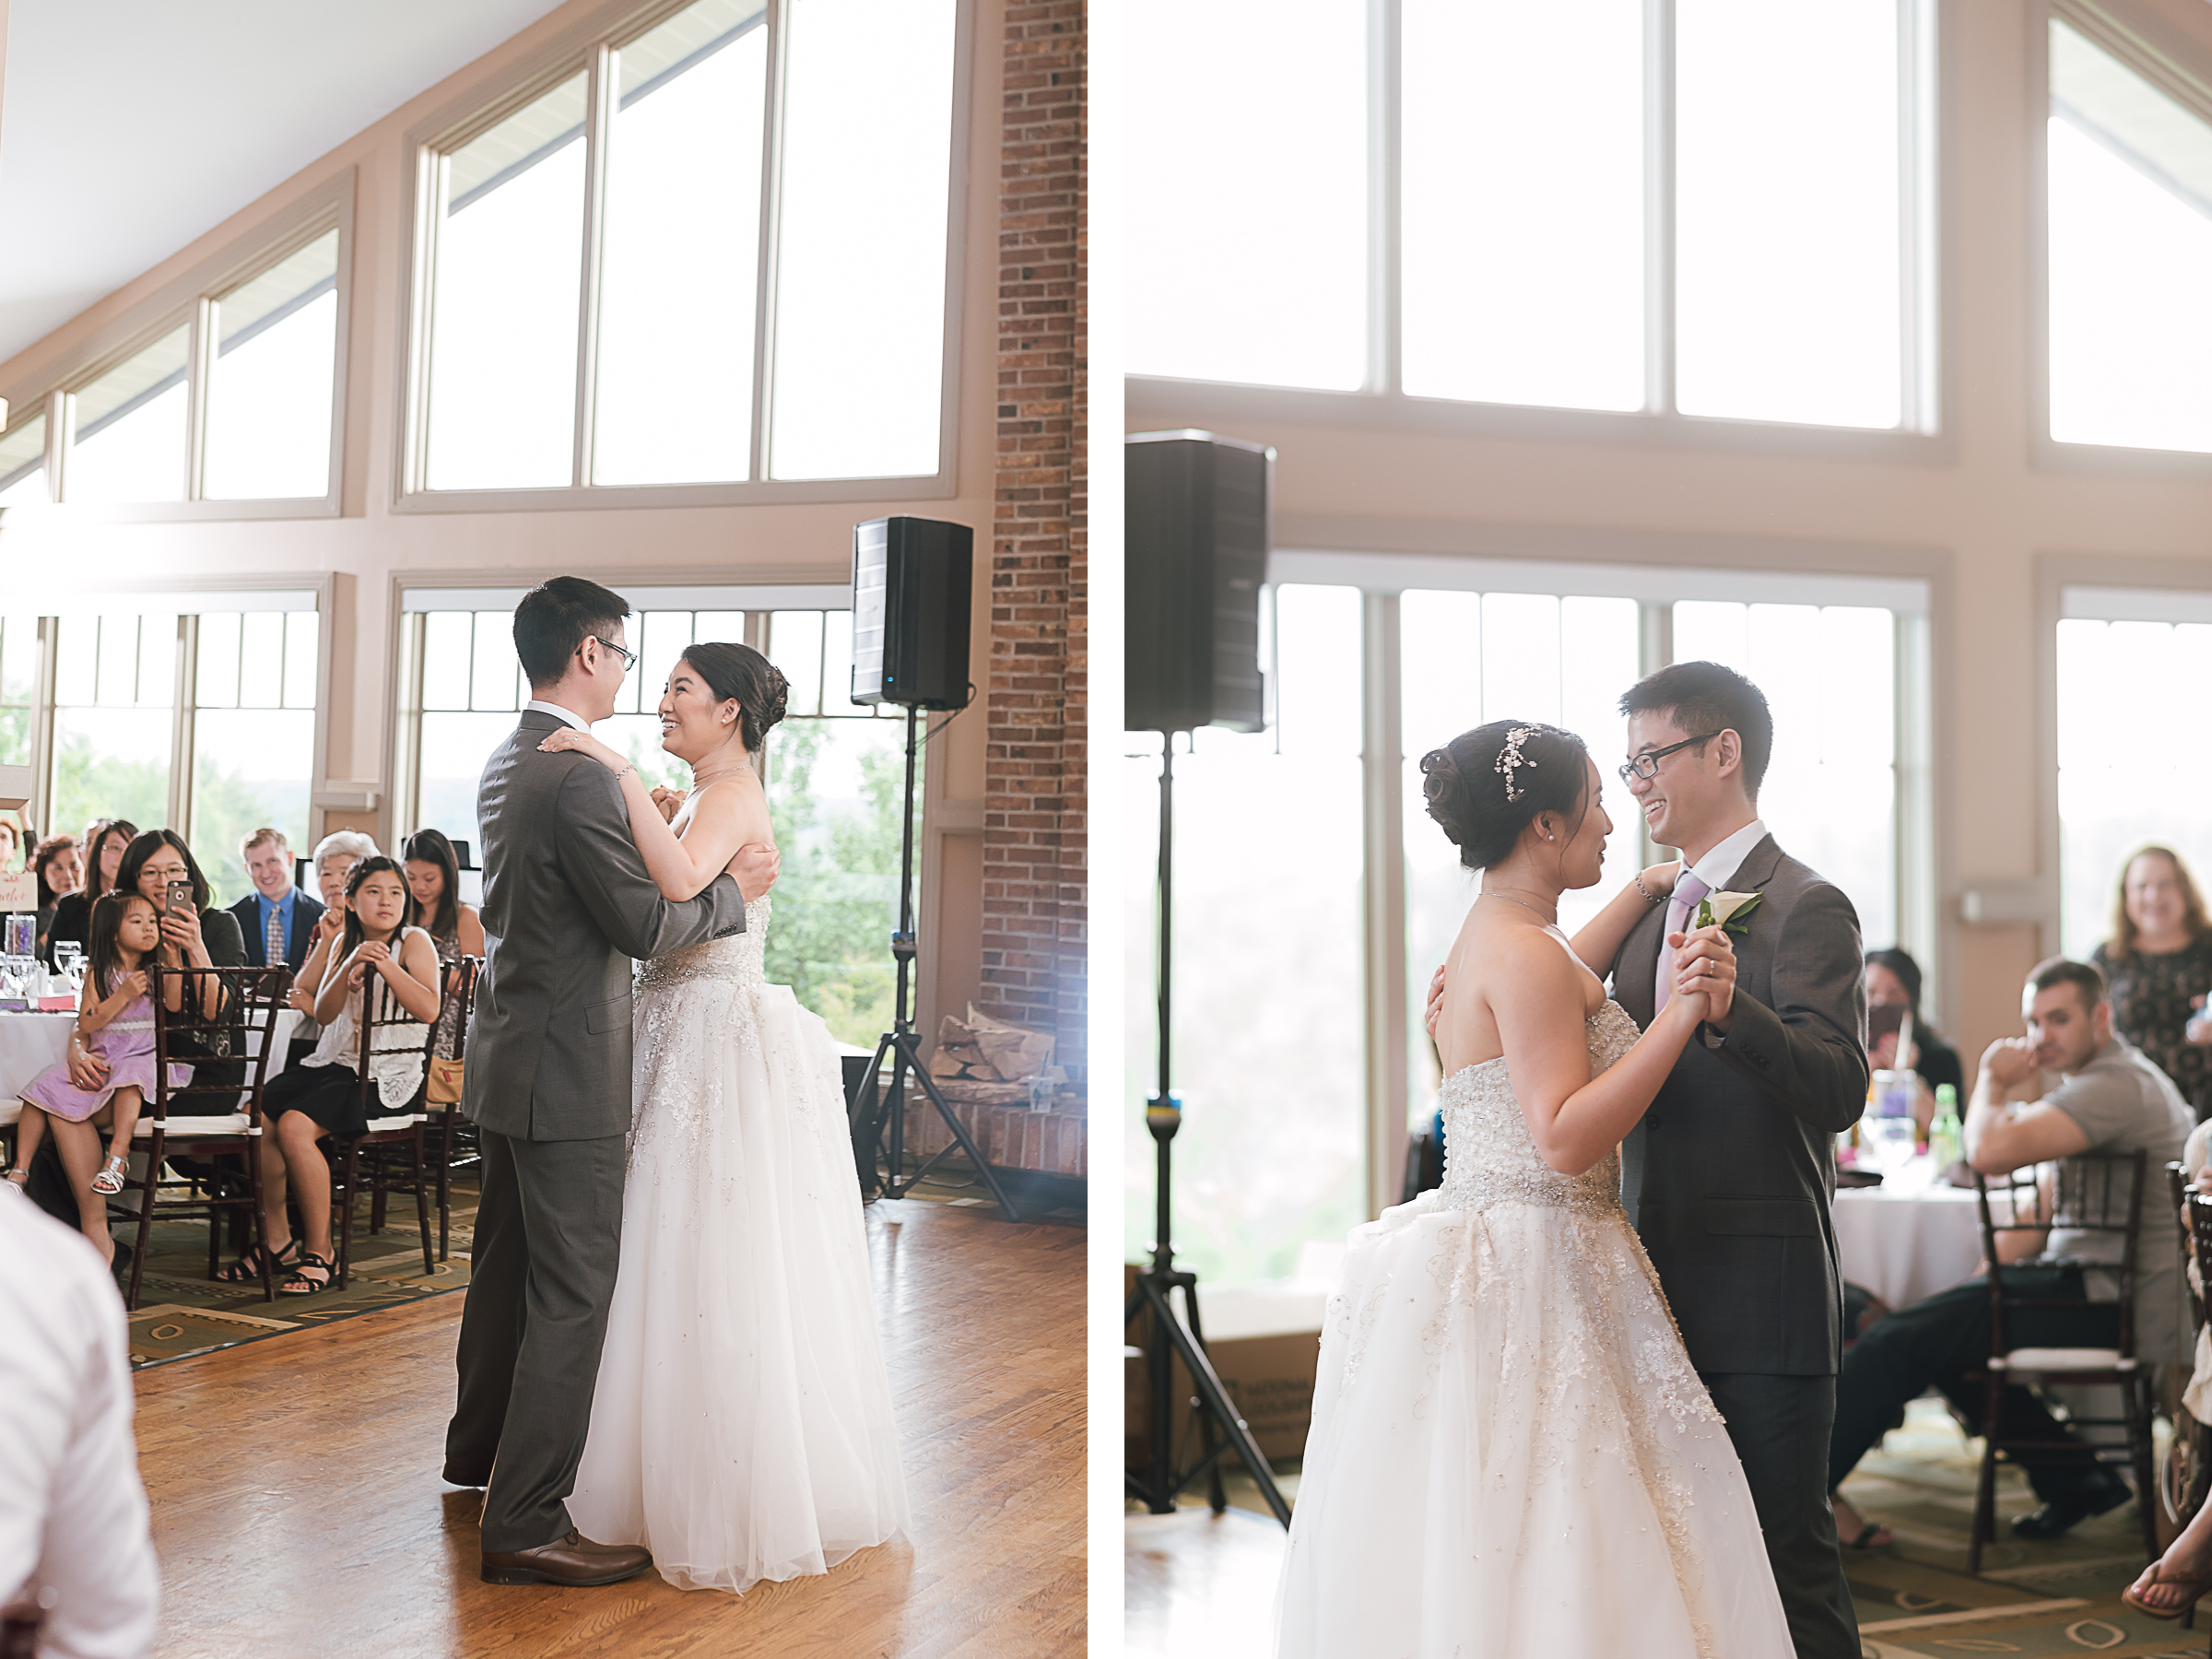 MD-Wedding-Bretton-Woods-Reception-First-Dance.jpg